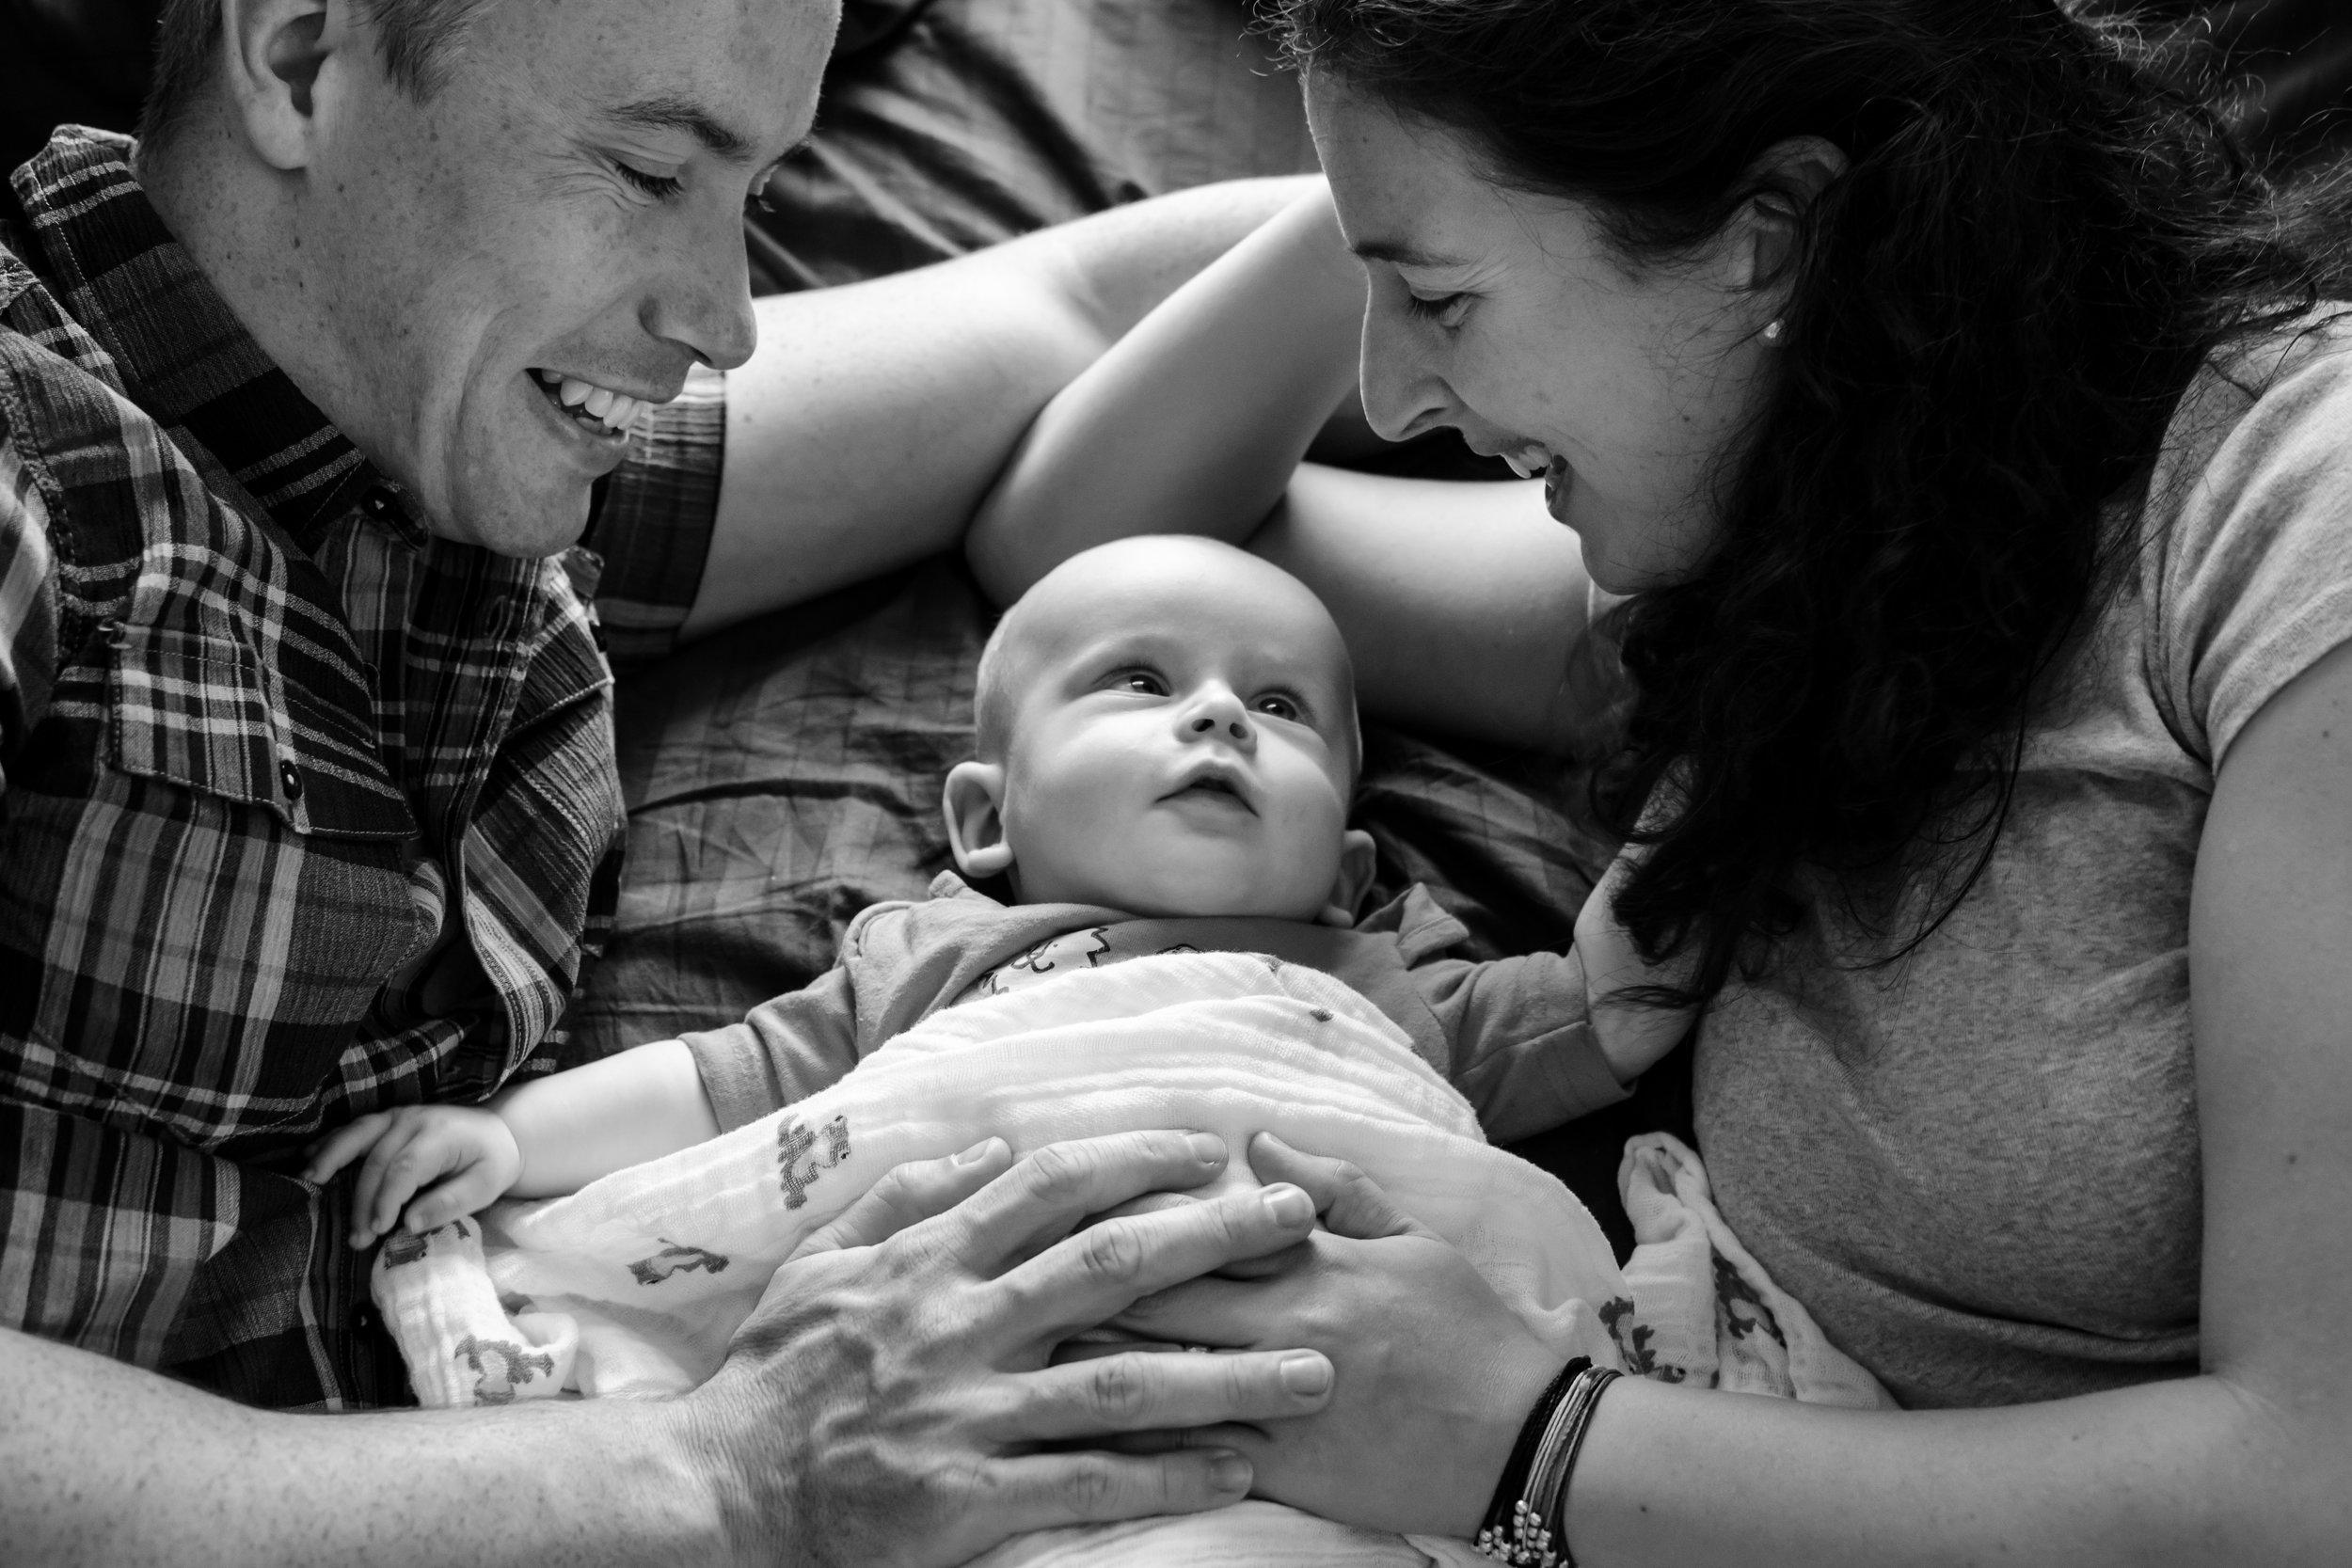 JuliaMatthewsPhotography_MadisonWisconsinFamilyPhotography_Newborn-3.jpg